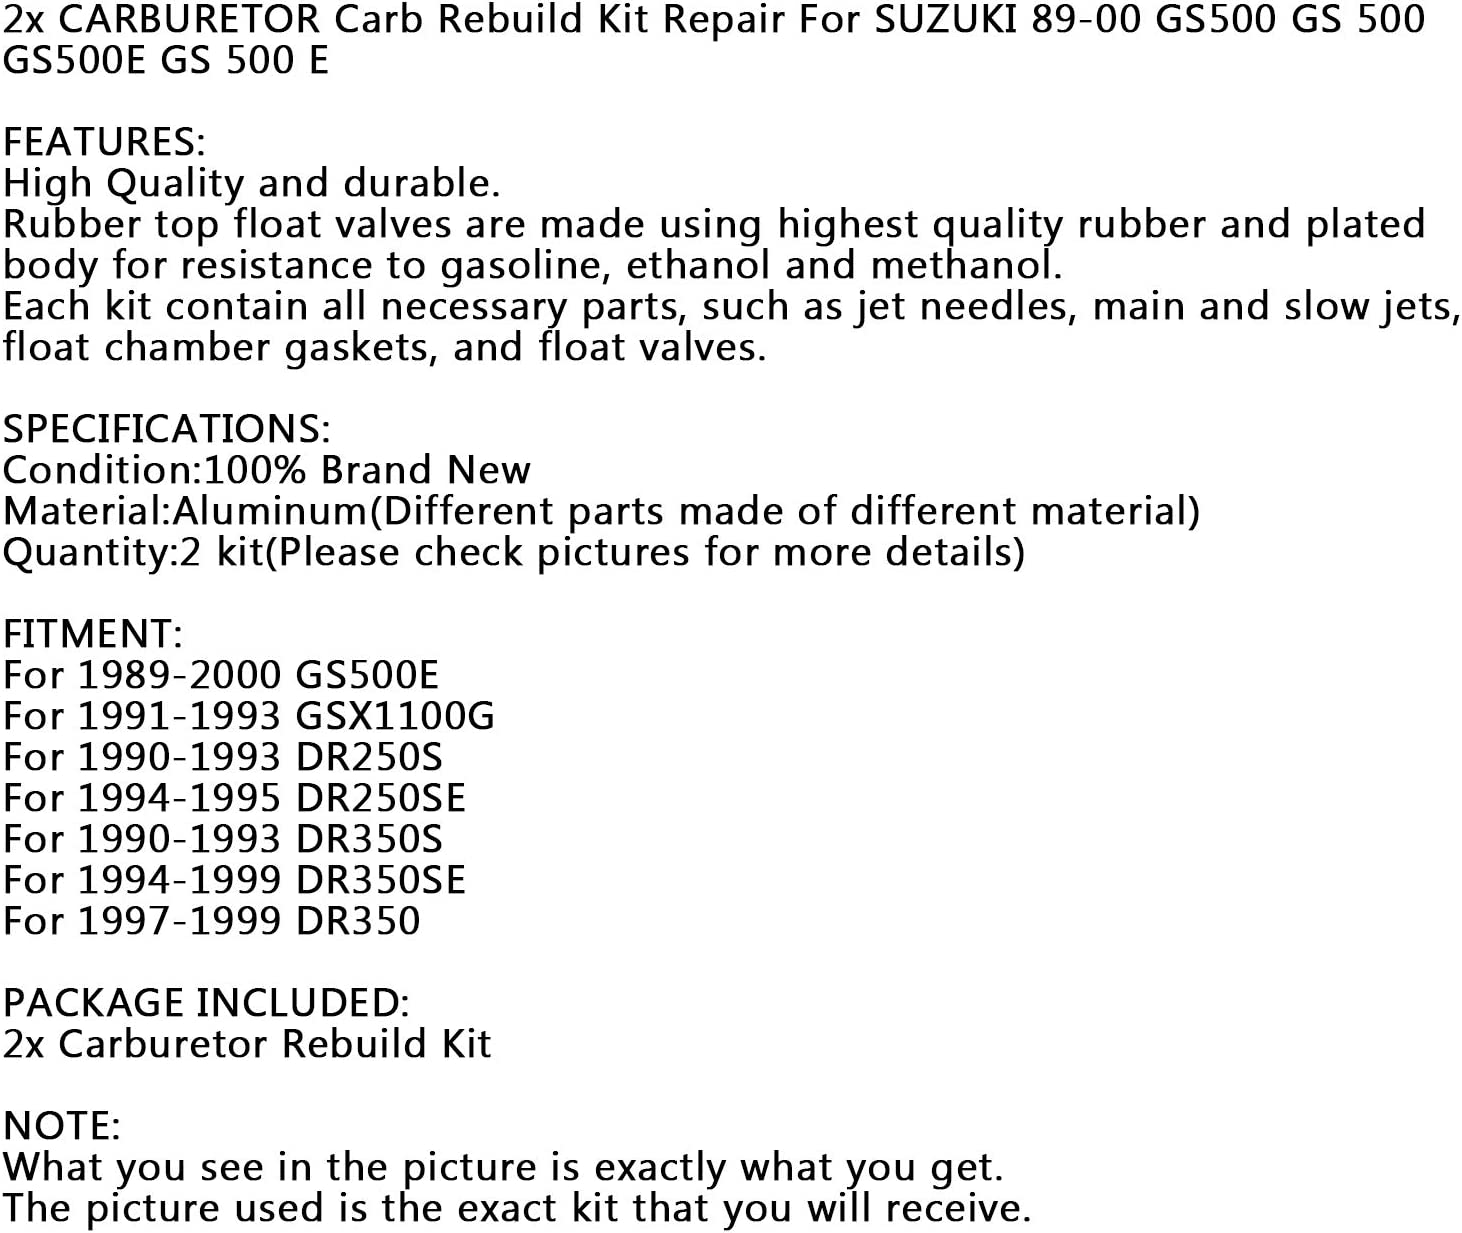 Topteng 2x Carburetor Carb Rebuild Repair Kit for Miku-ni BST 33 for B-M-W F650 Suzu-ki GS500E